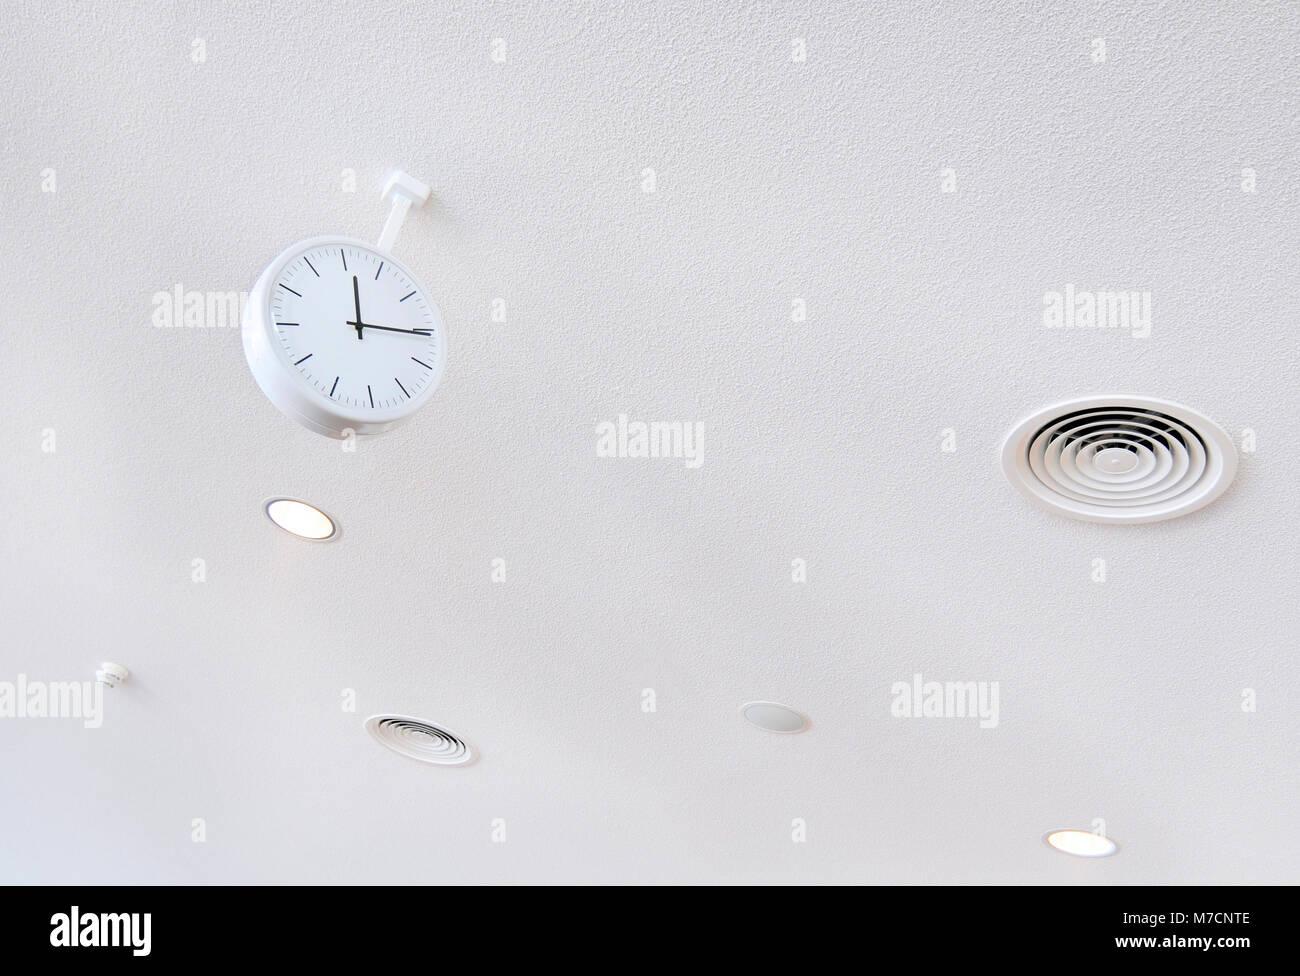 white clock on white futuristic background close-up - Stock Image